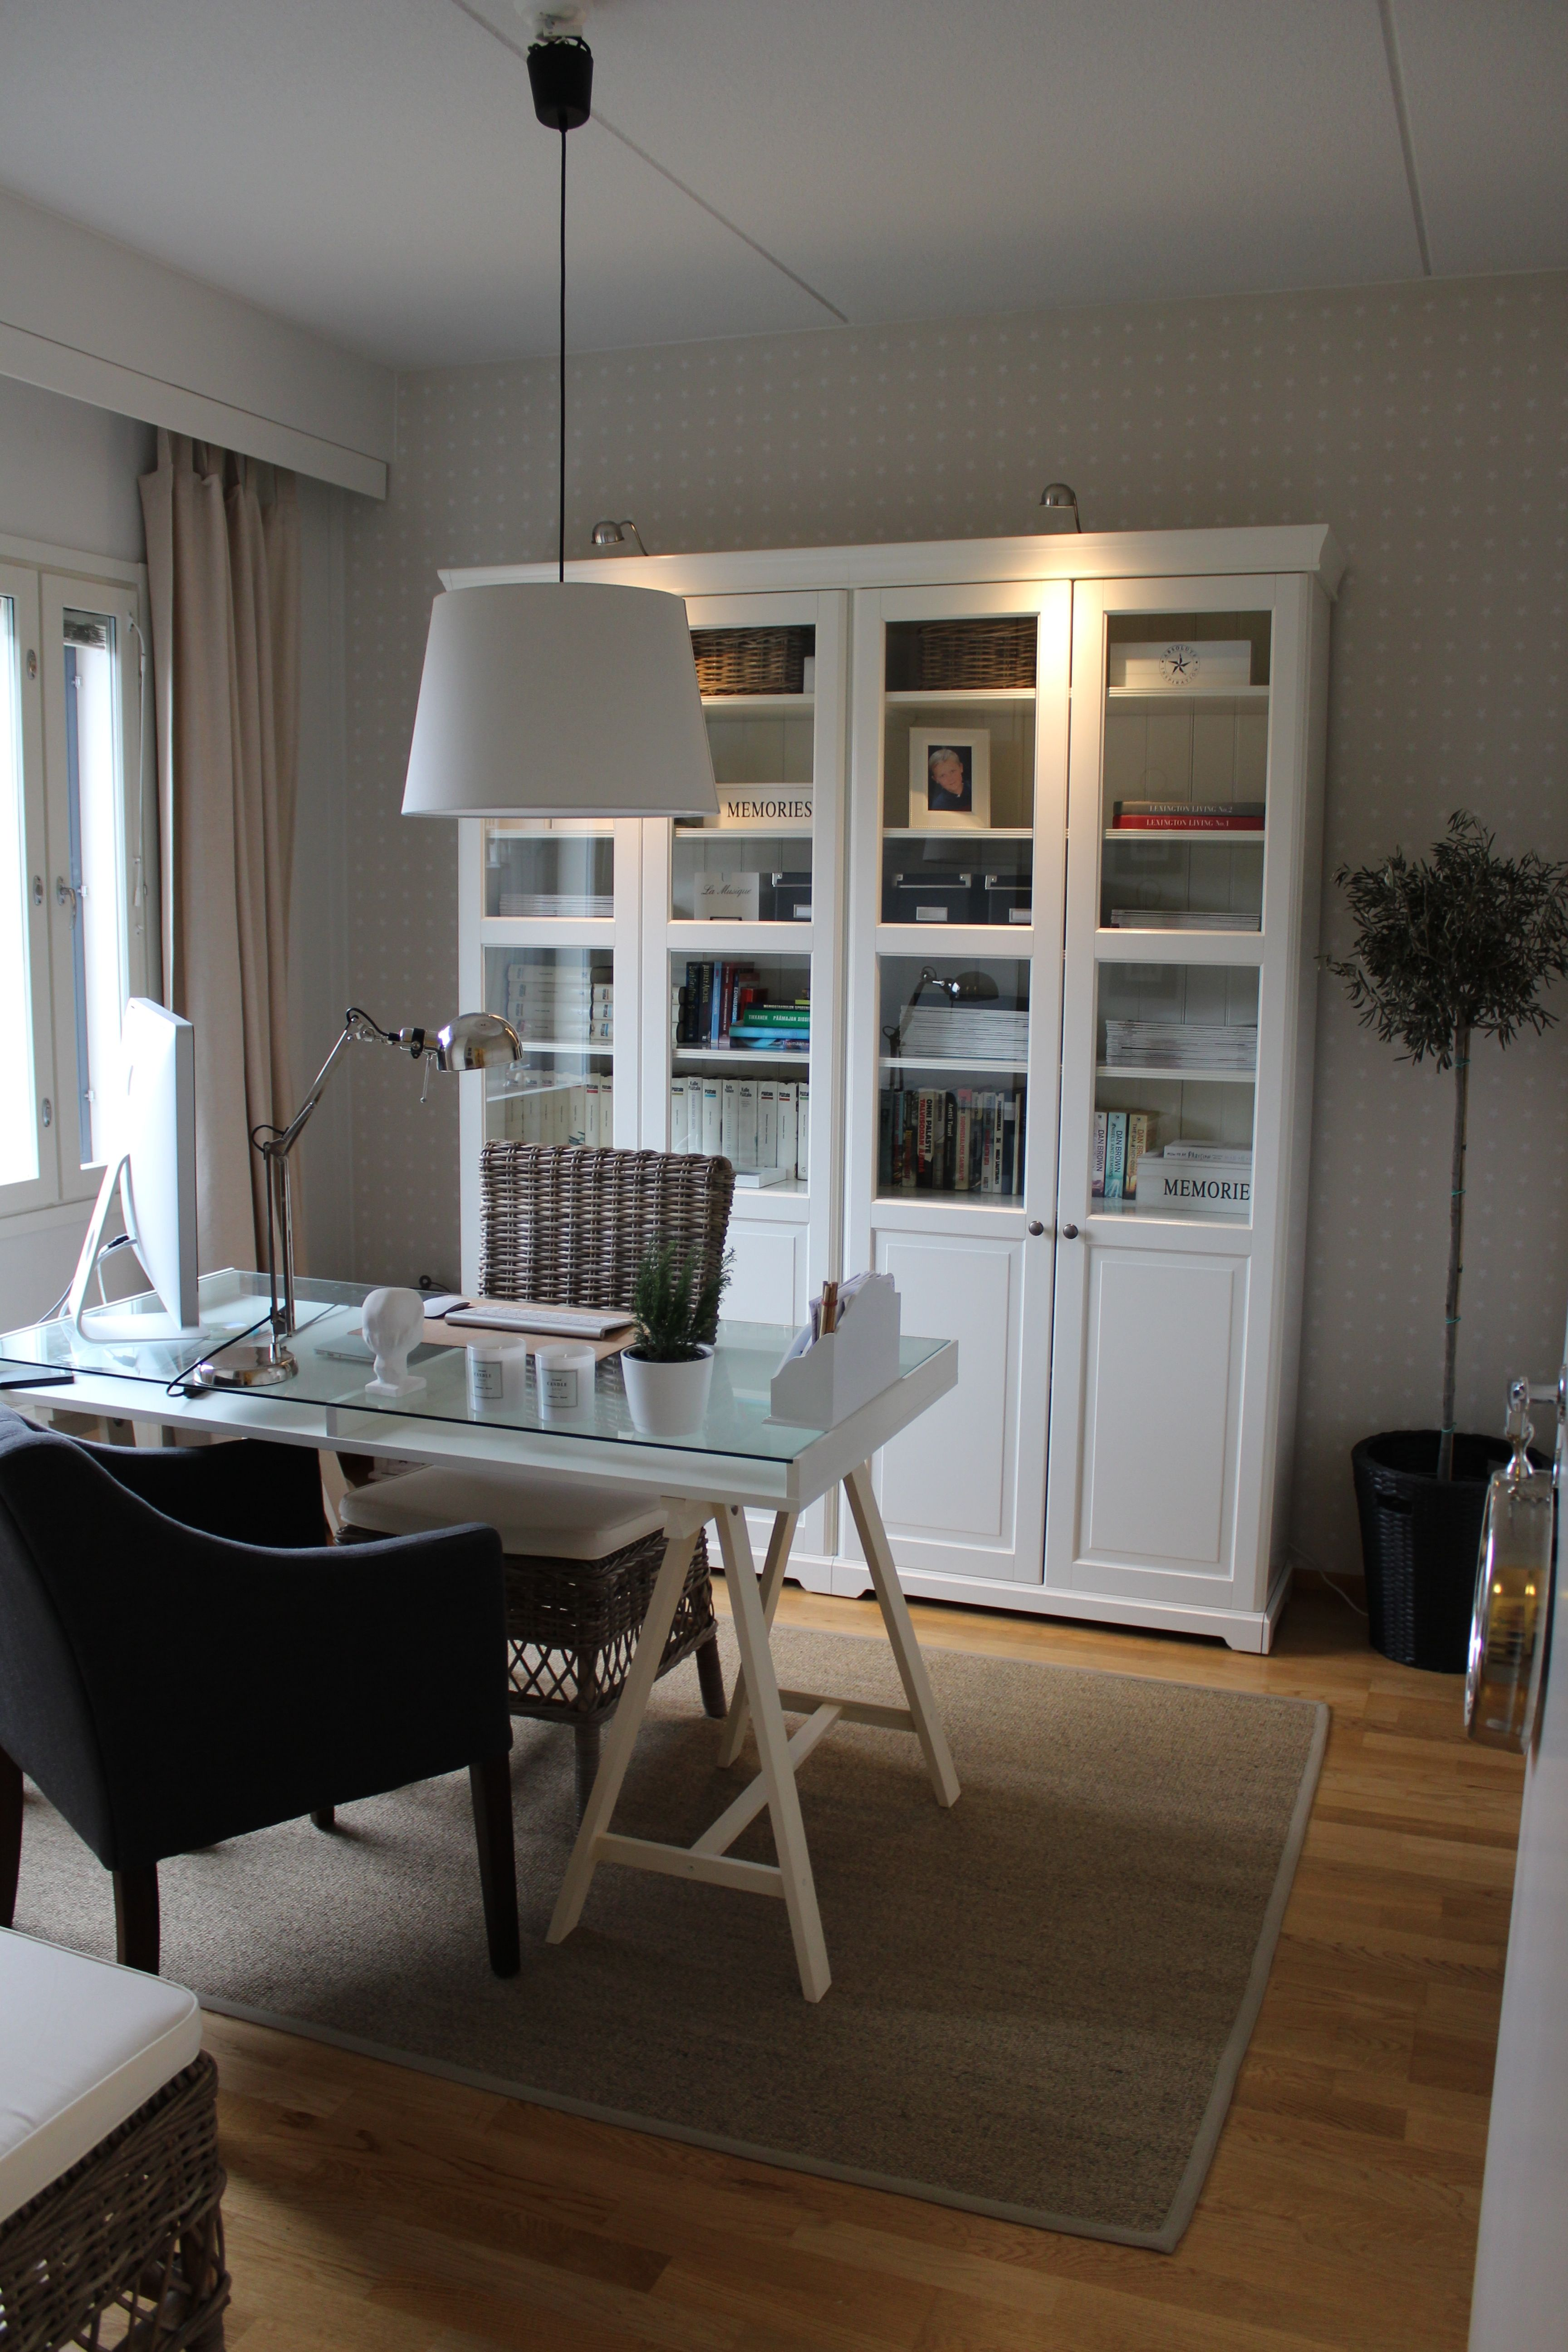 home office ikea liatorp new england style olive tree sisal rattan